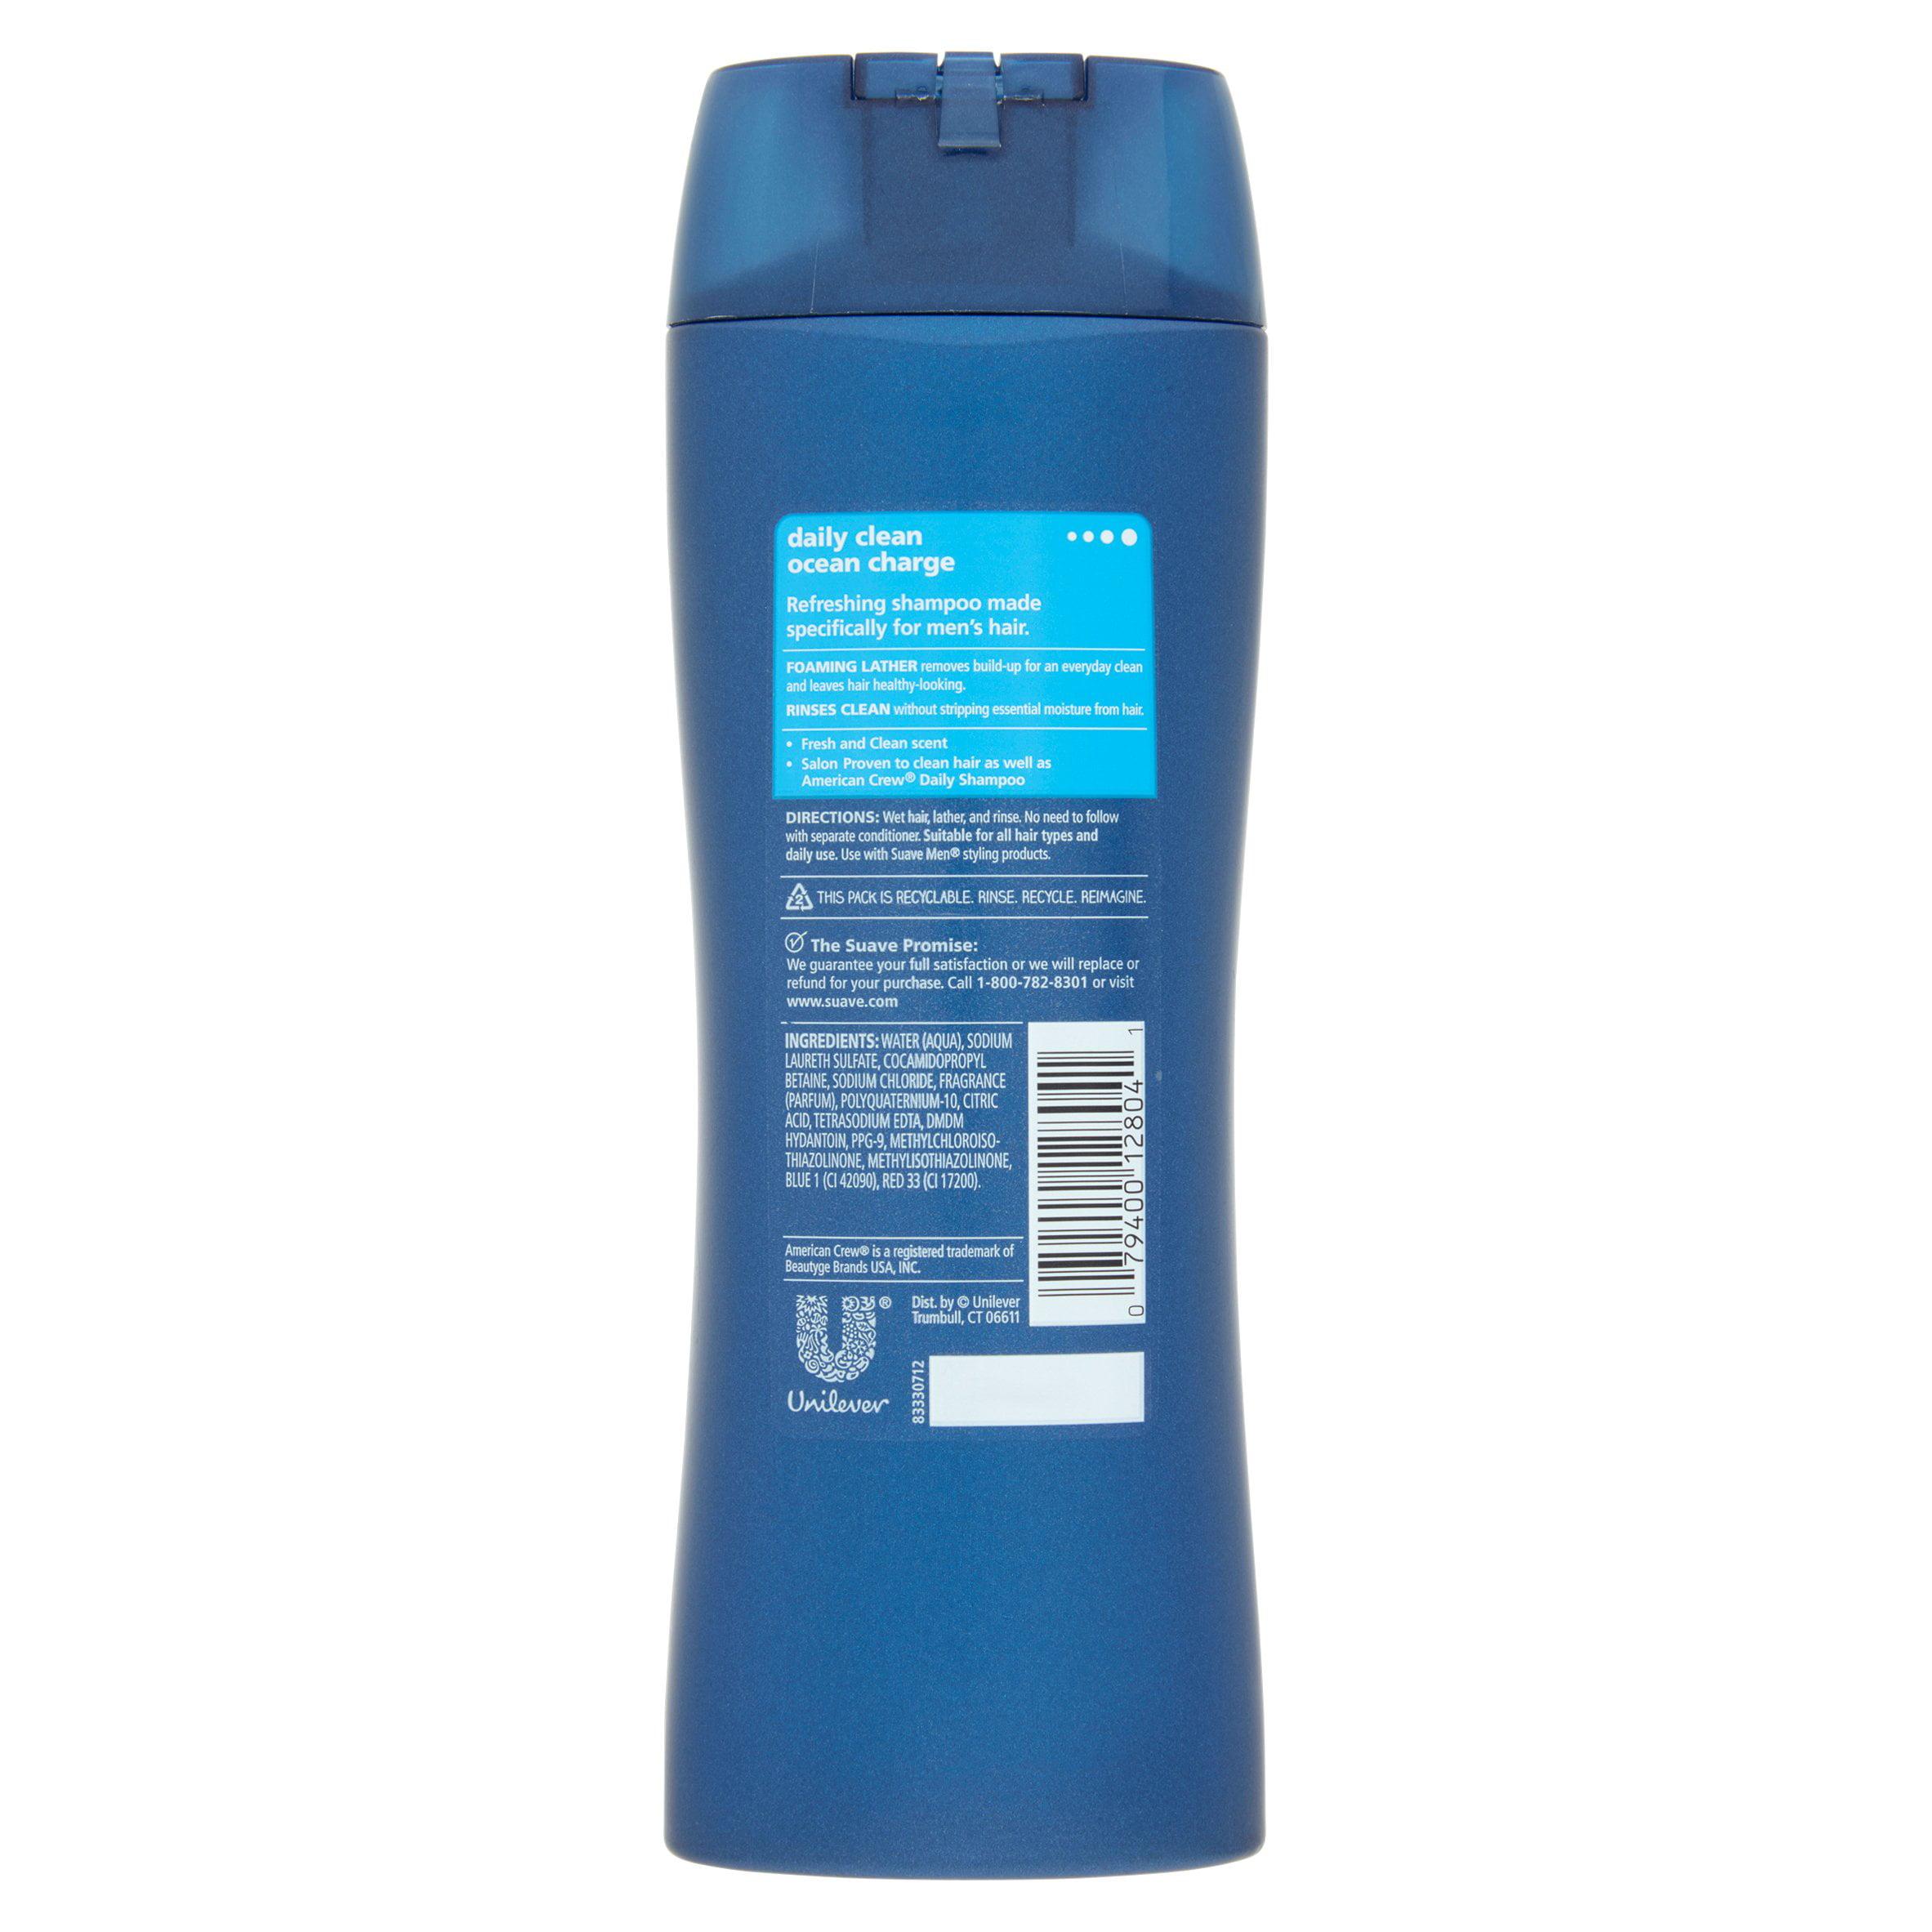 Dettol Gold Sabun Mandi Cair Daily Clean 300 Ml Refill 250 250ml X2pcs Body Wash Classic Reffil